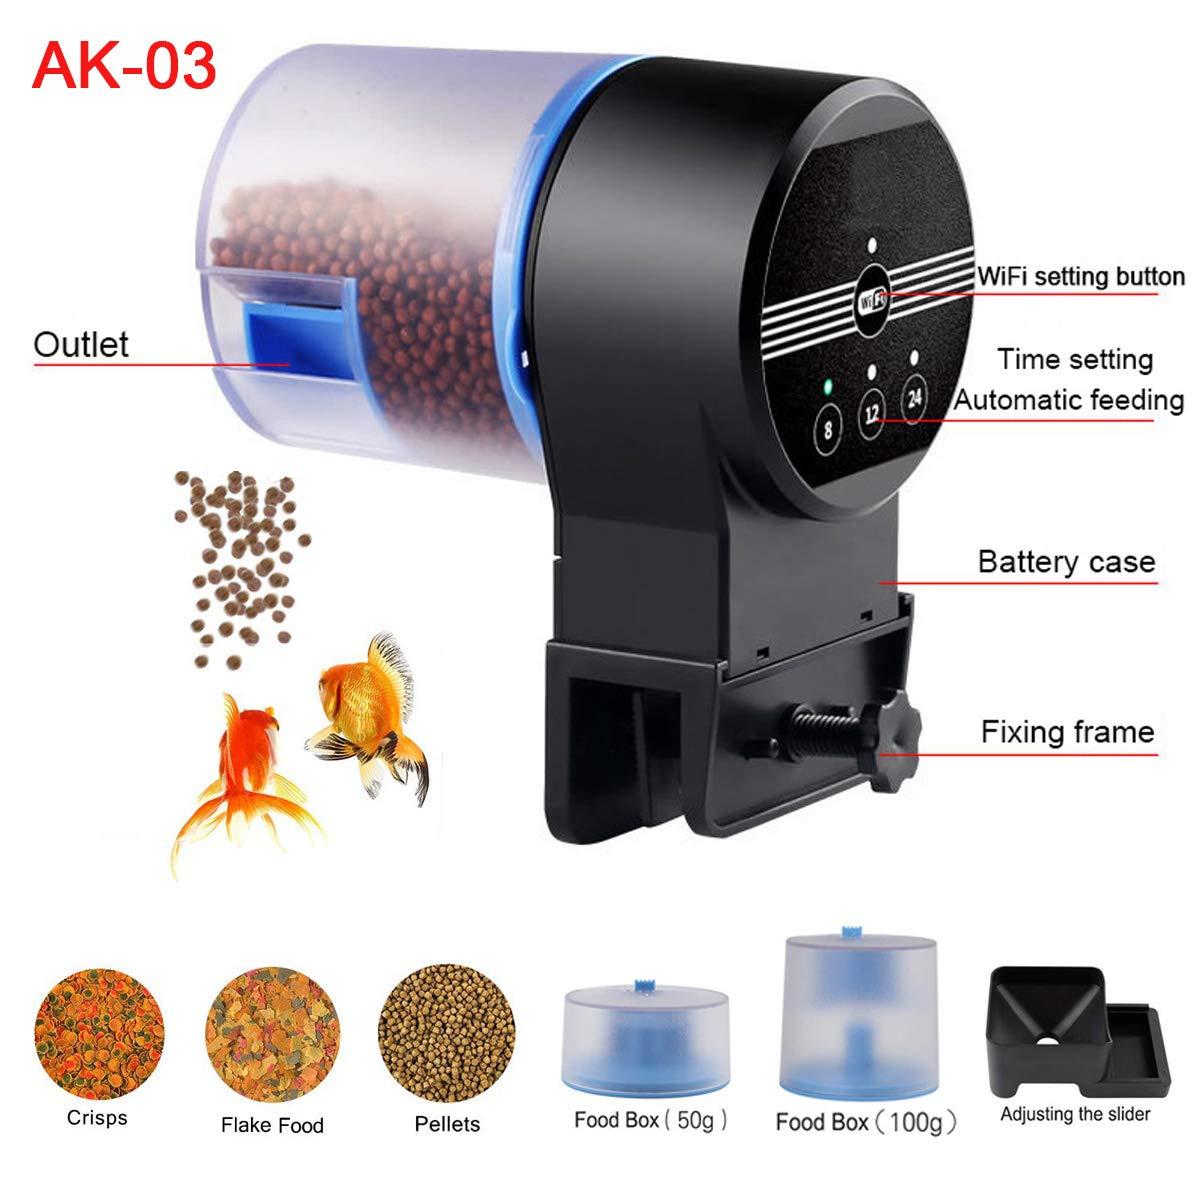 Automatic Fish Feeders by ALZERO, Electric Automatic/Manual Fish Feeder, Aquarium Tank Timer Feeder & Weekend 2 Fish Food Dispenser (AK-03)